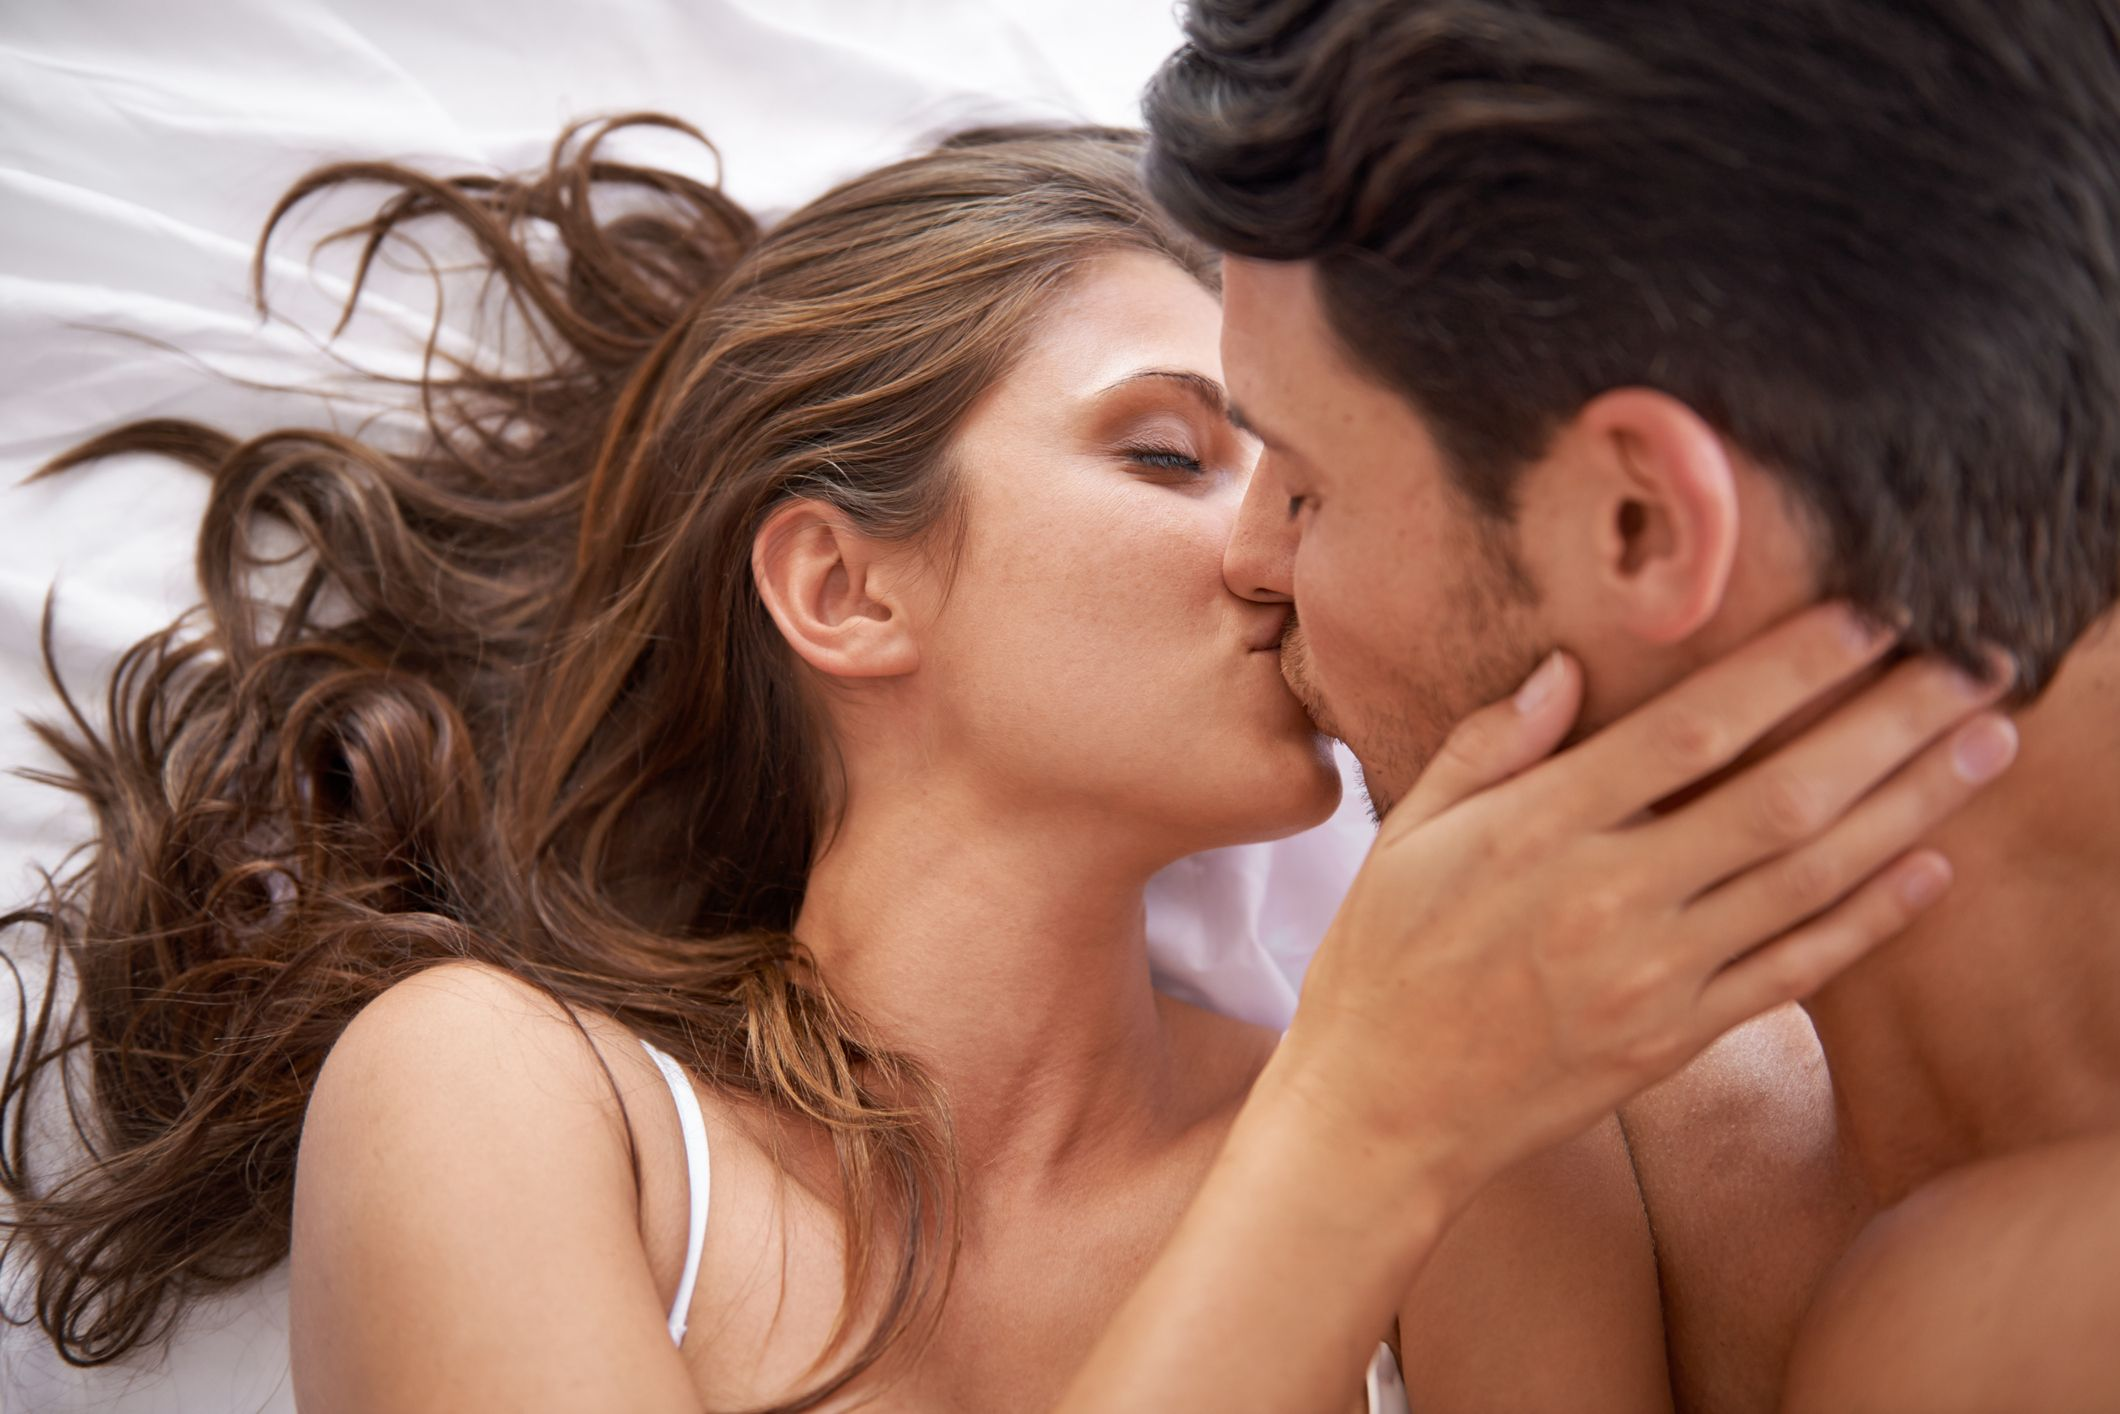 12 Random Ways to Turn Her On